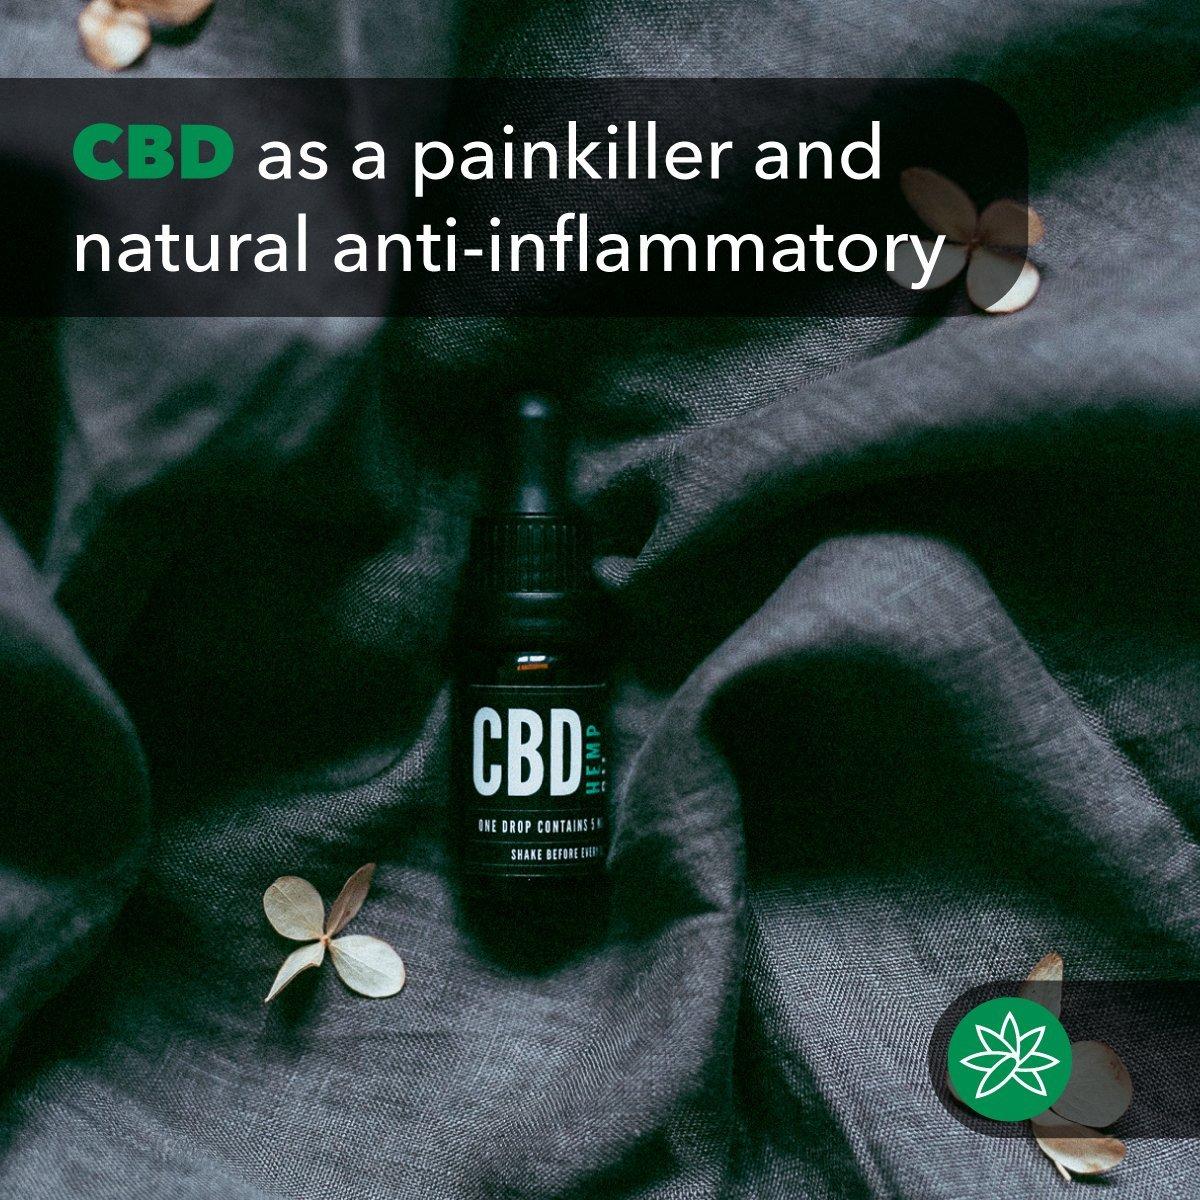 CBD as a painkiller and natural anti-inflammatory